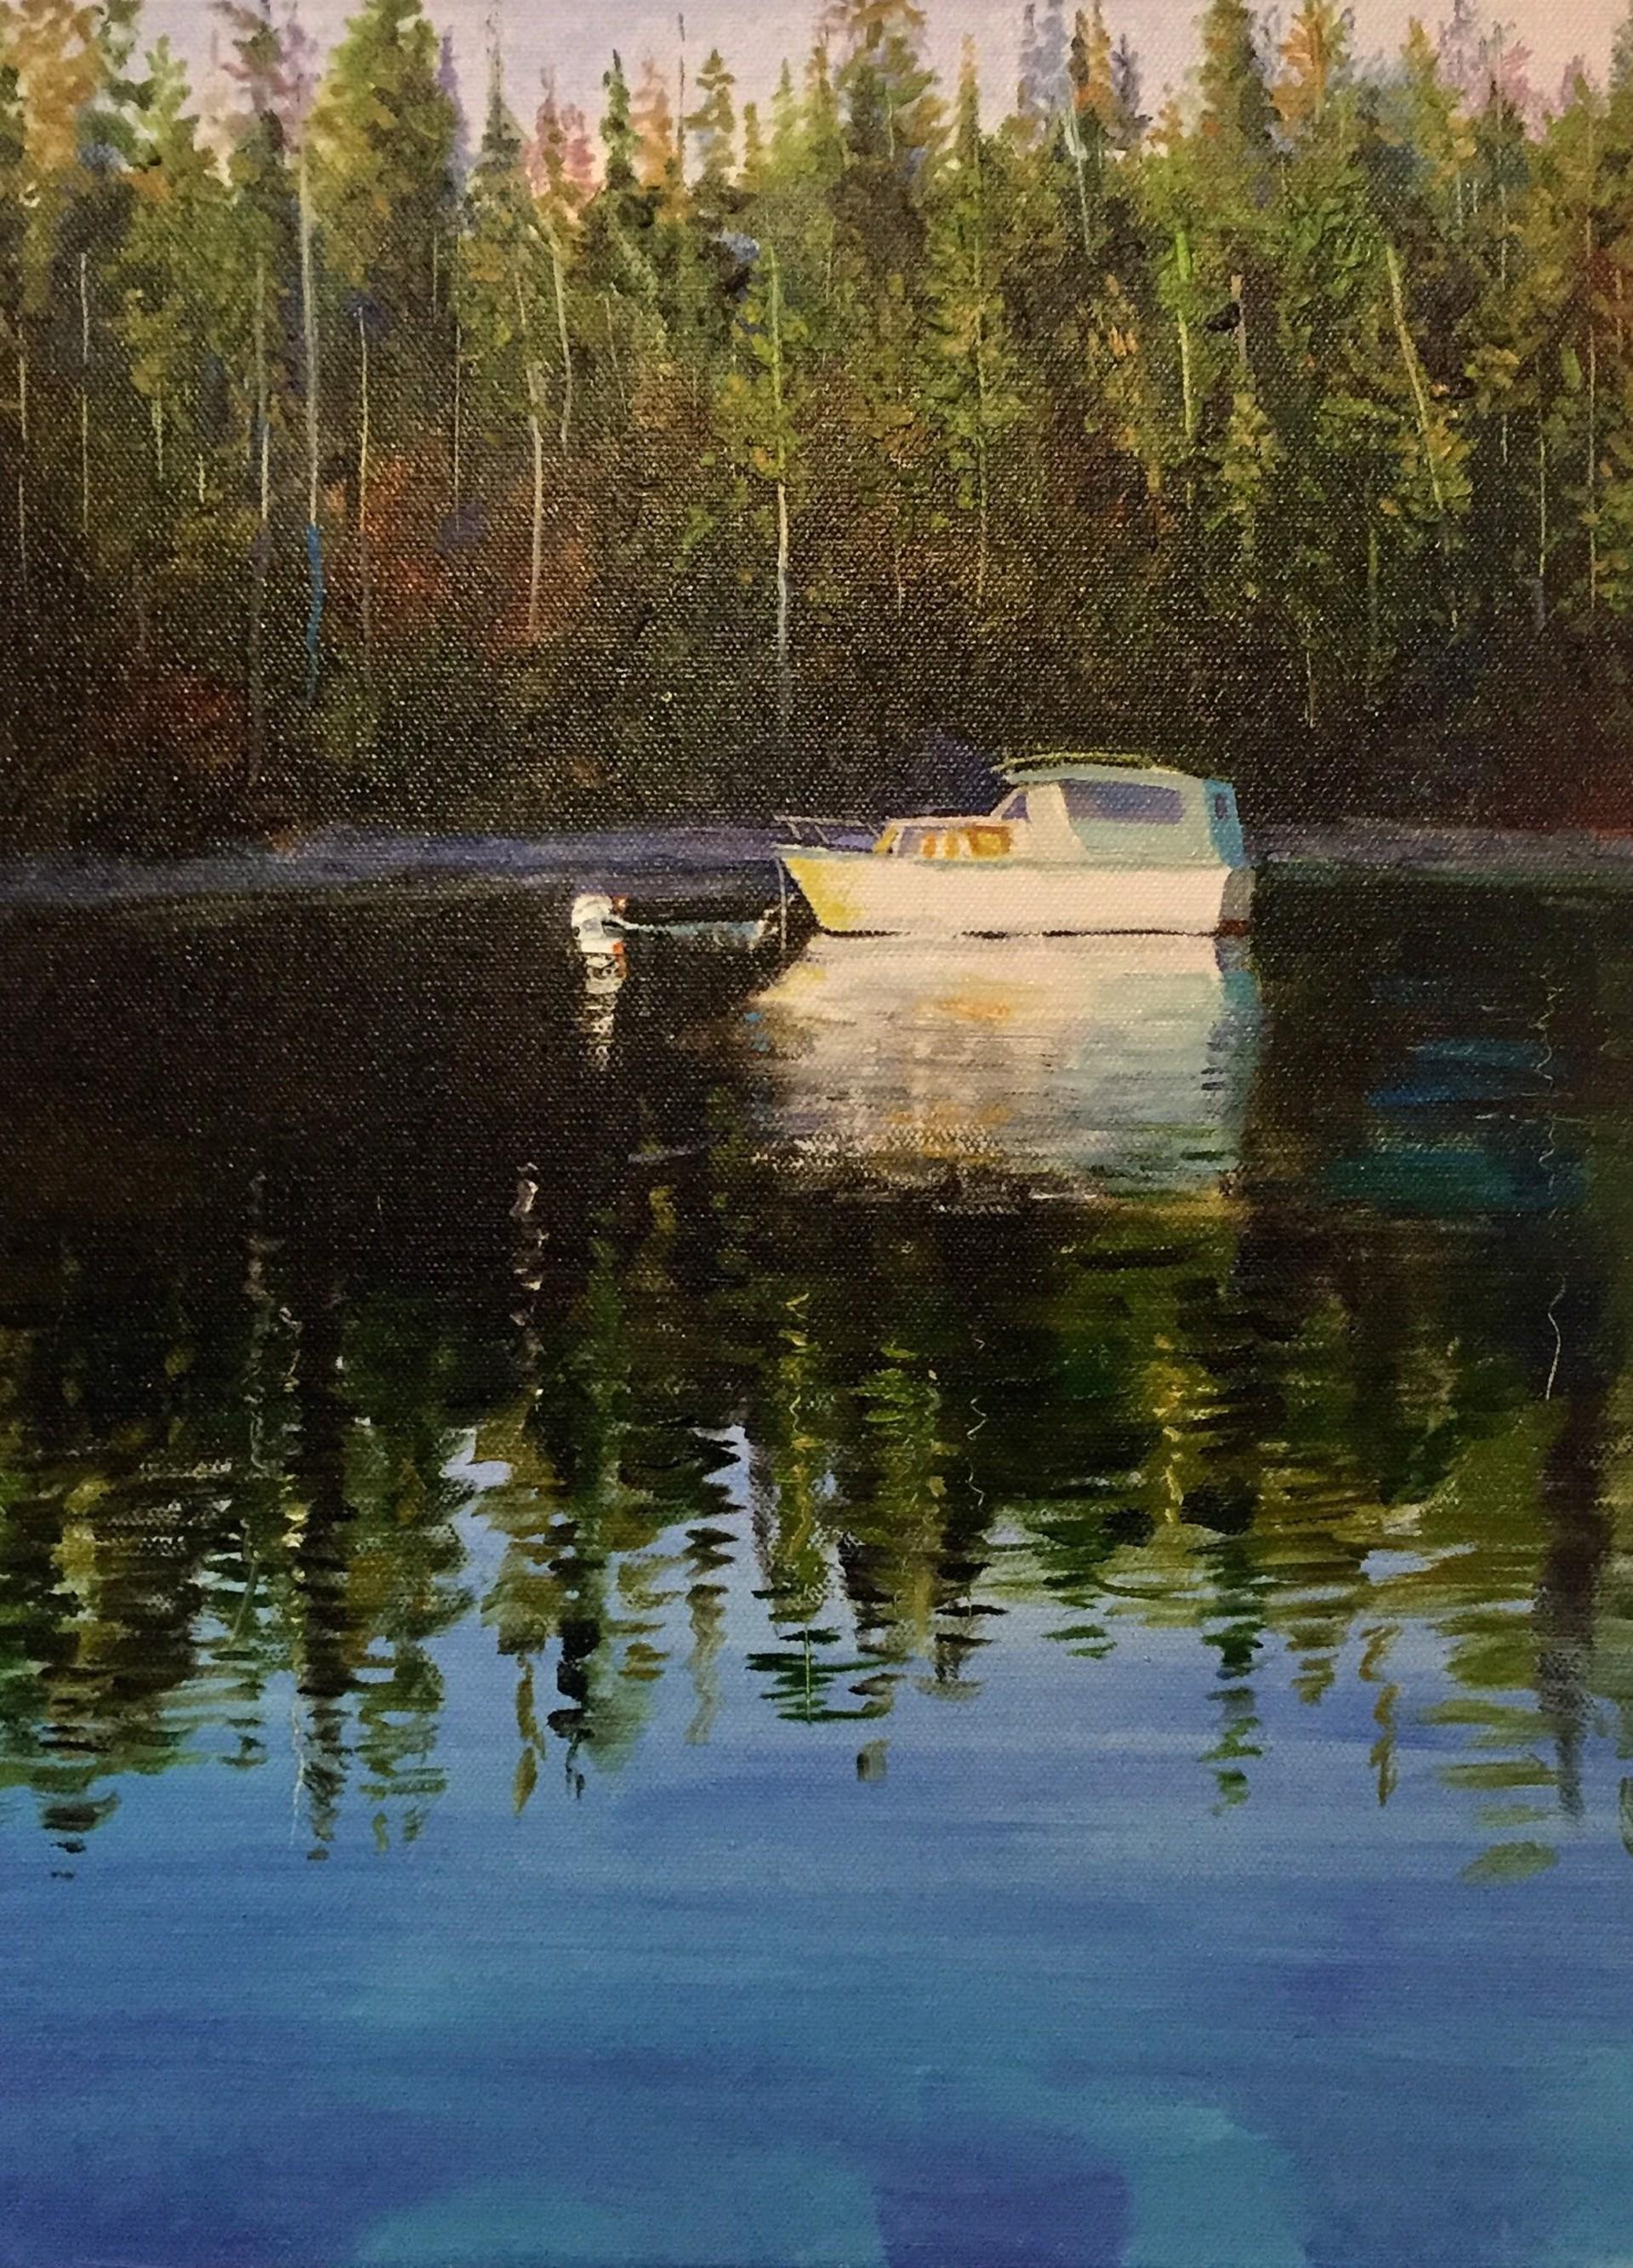 Waking on the Water by Dan Knepper